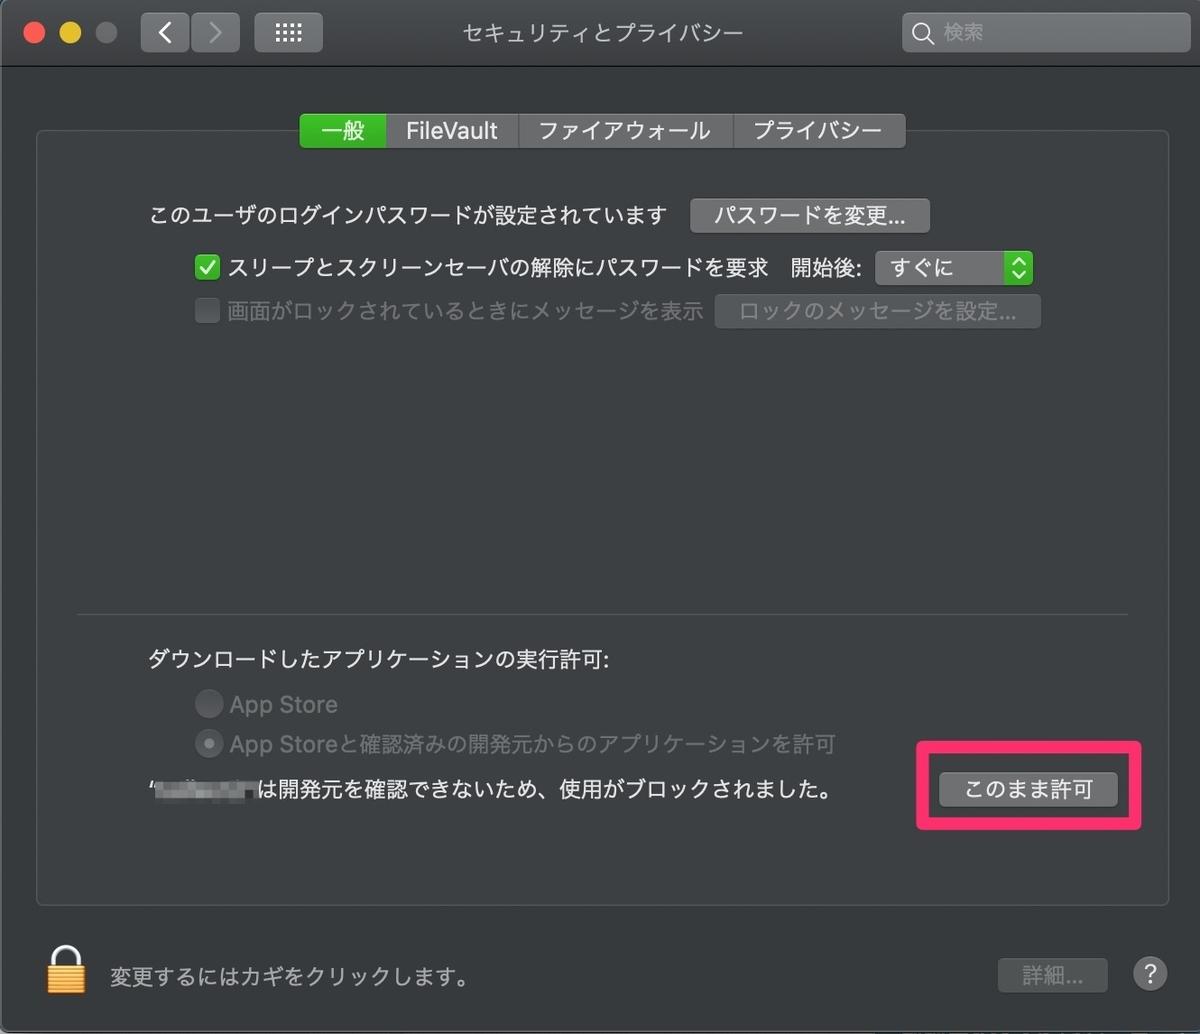 Macで開発元を検証できないため開けません。と表示されるファイルを開く方法